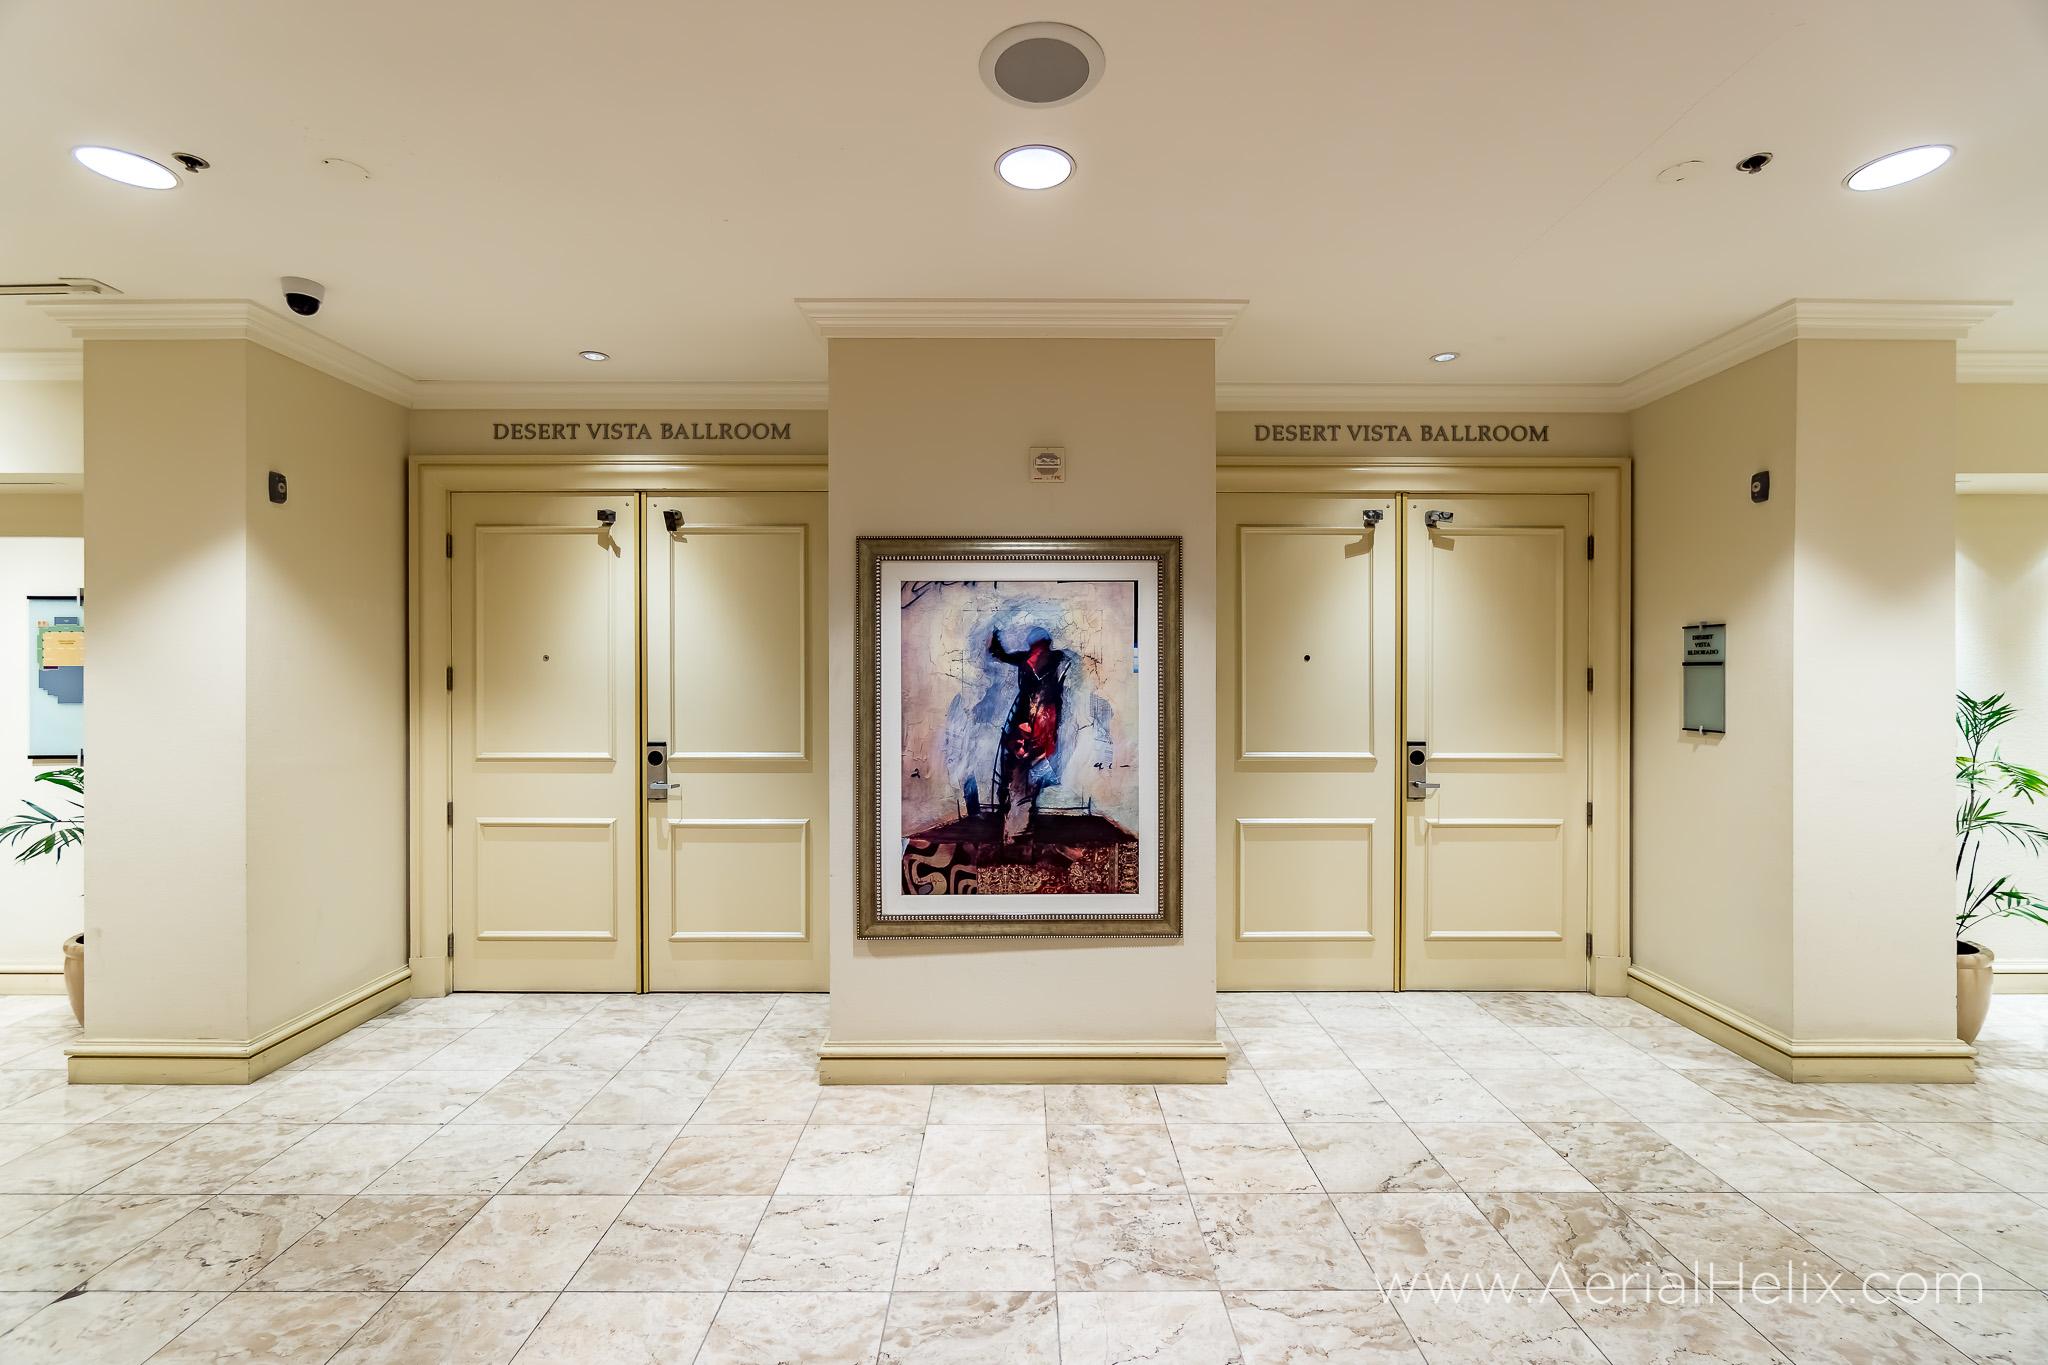 Indian Wells Hyatt Regency Set 1-19.jpg